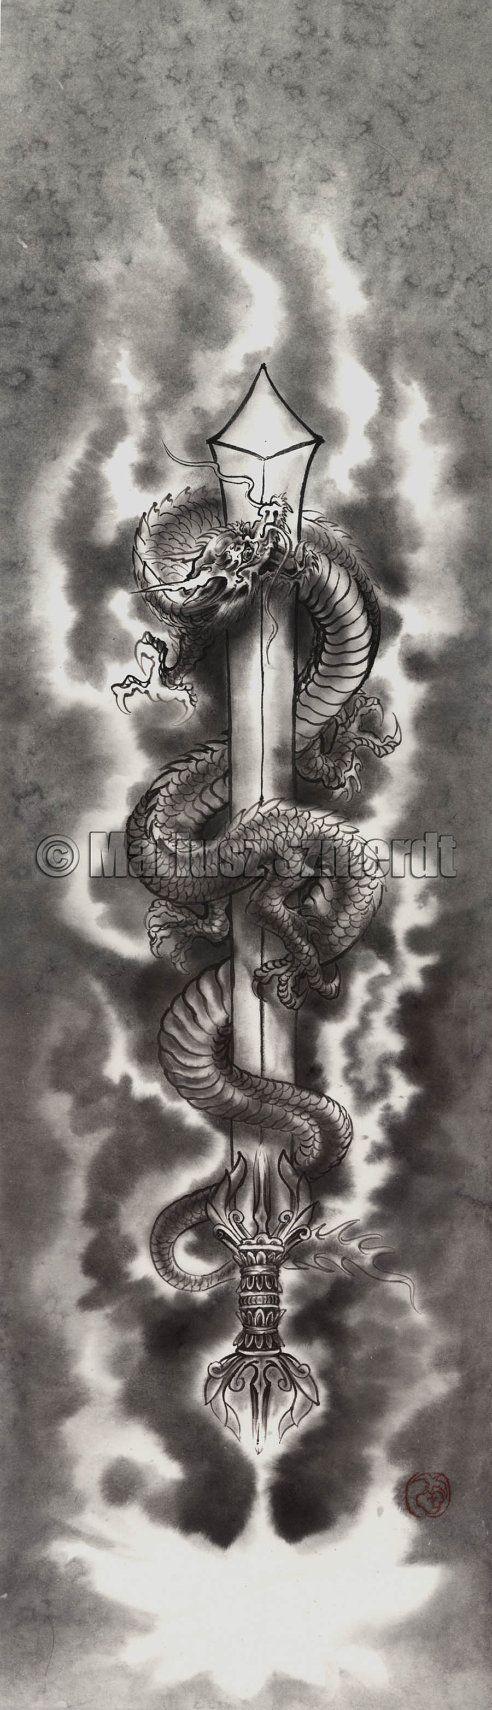 Original japanese sumi-e handmade art KURIKARA Fudo Myo-o DRAGON SWORD ink painting artist Mariusz Szmerdt watercolor black white grey